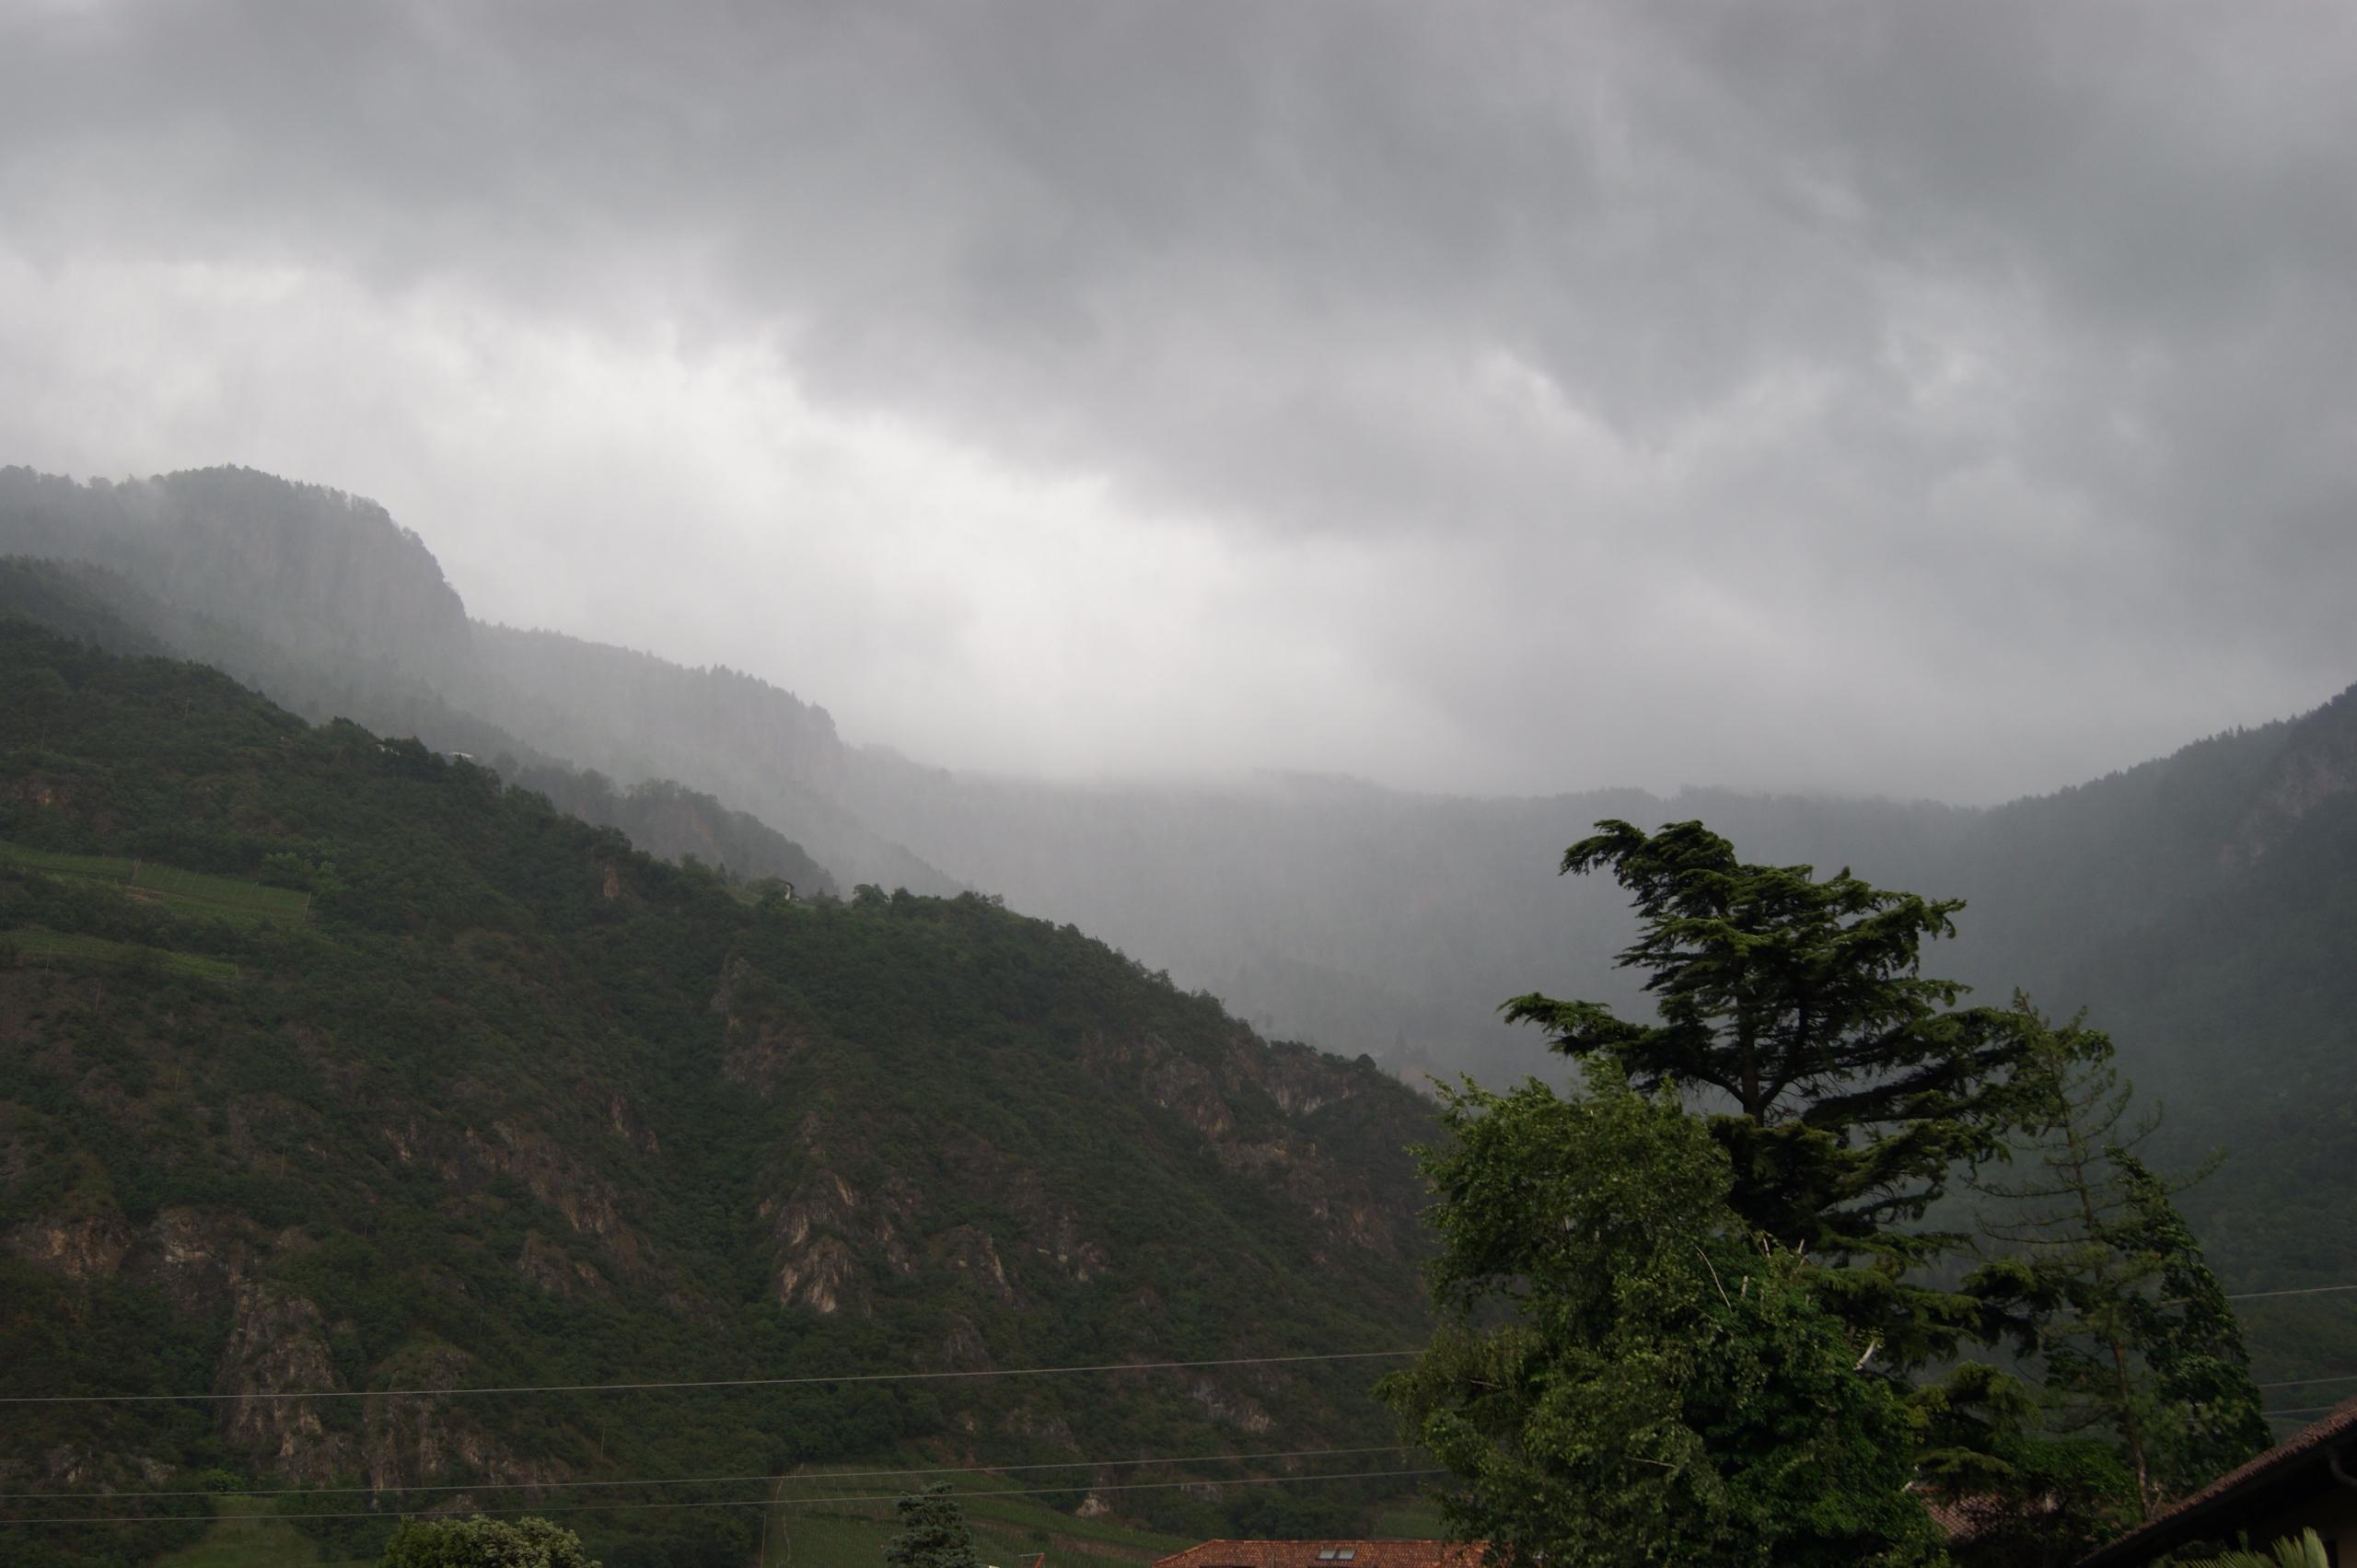 thunderstorm - flash, nature - santler | ello